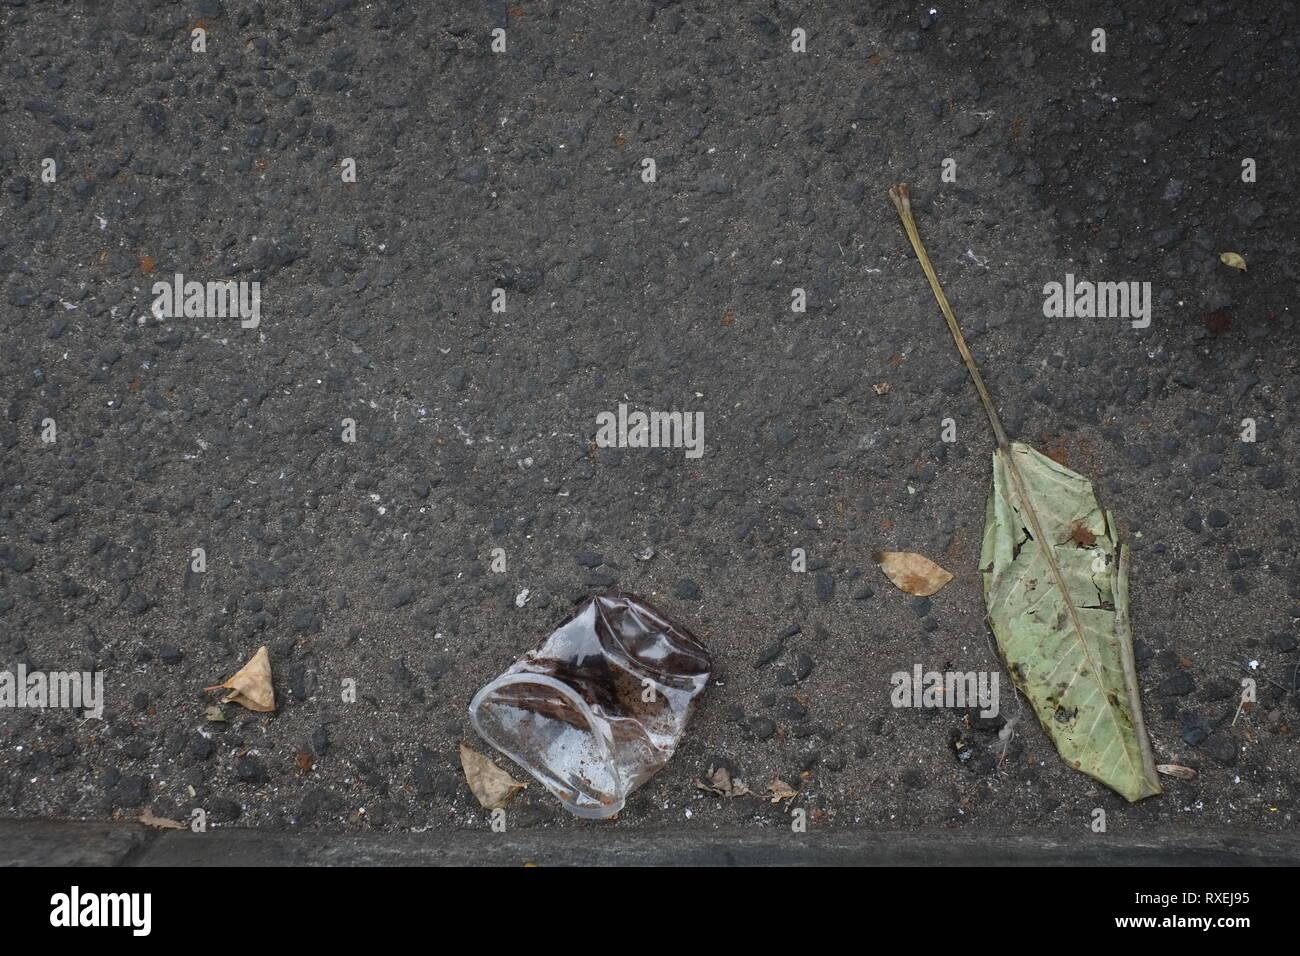 Plastic waste on streets. - Stock Image